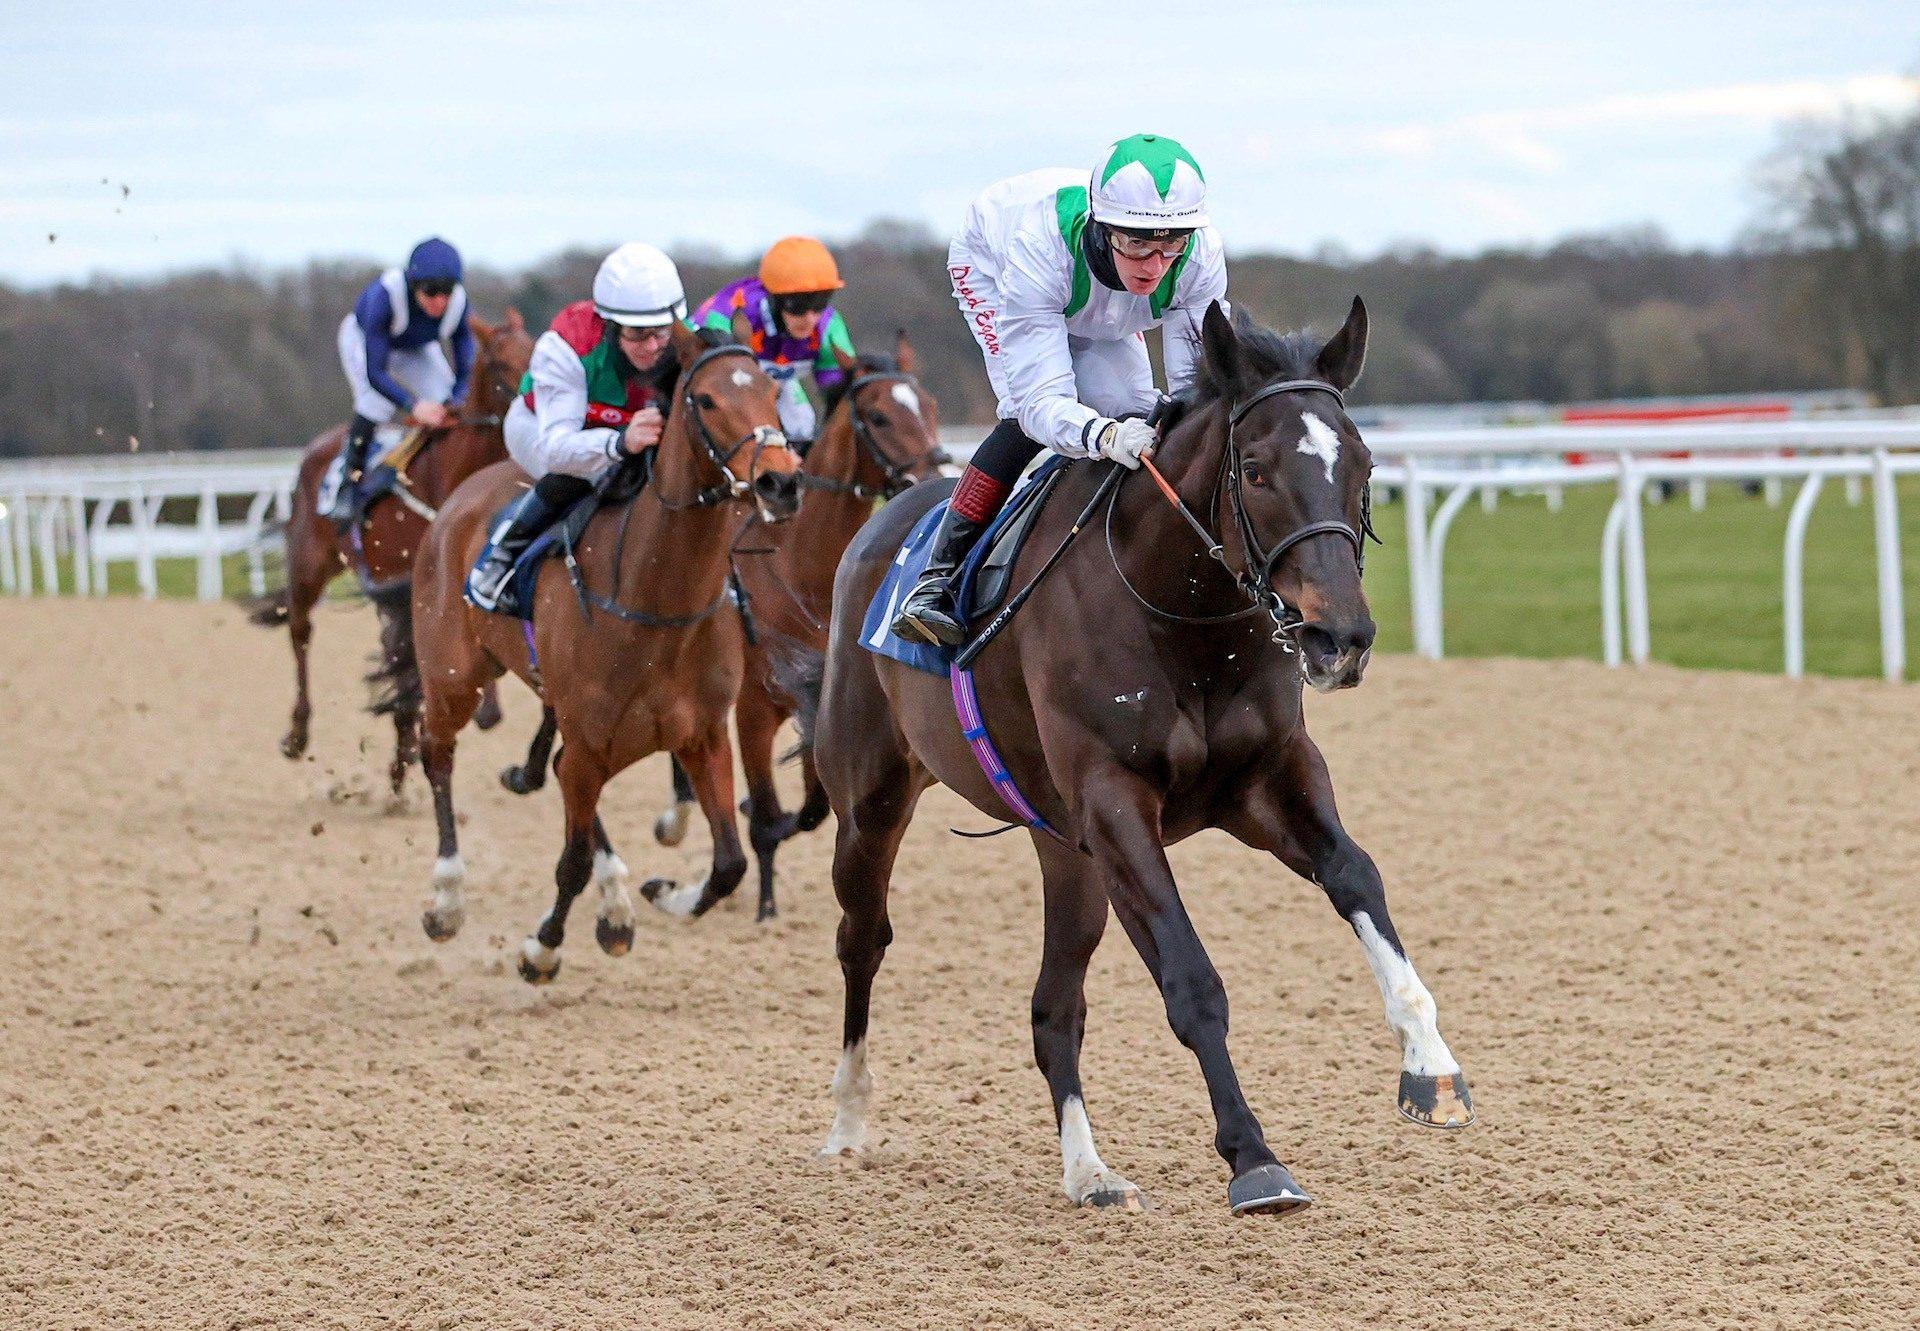 Dirham Emirati (Vadamos) Wins The Novice Stakes At Newcastle